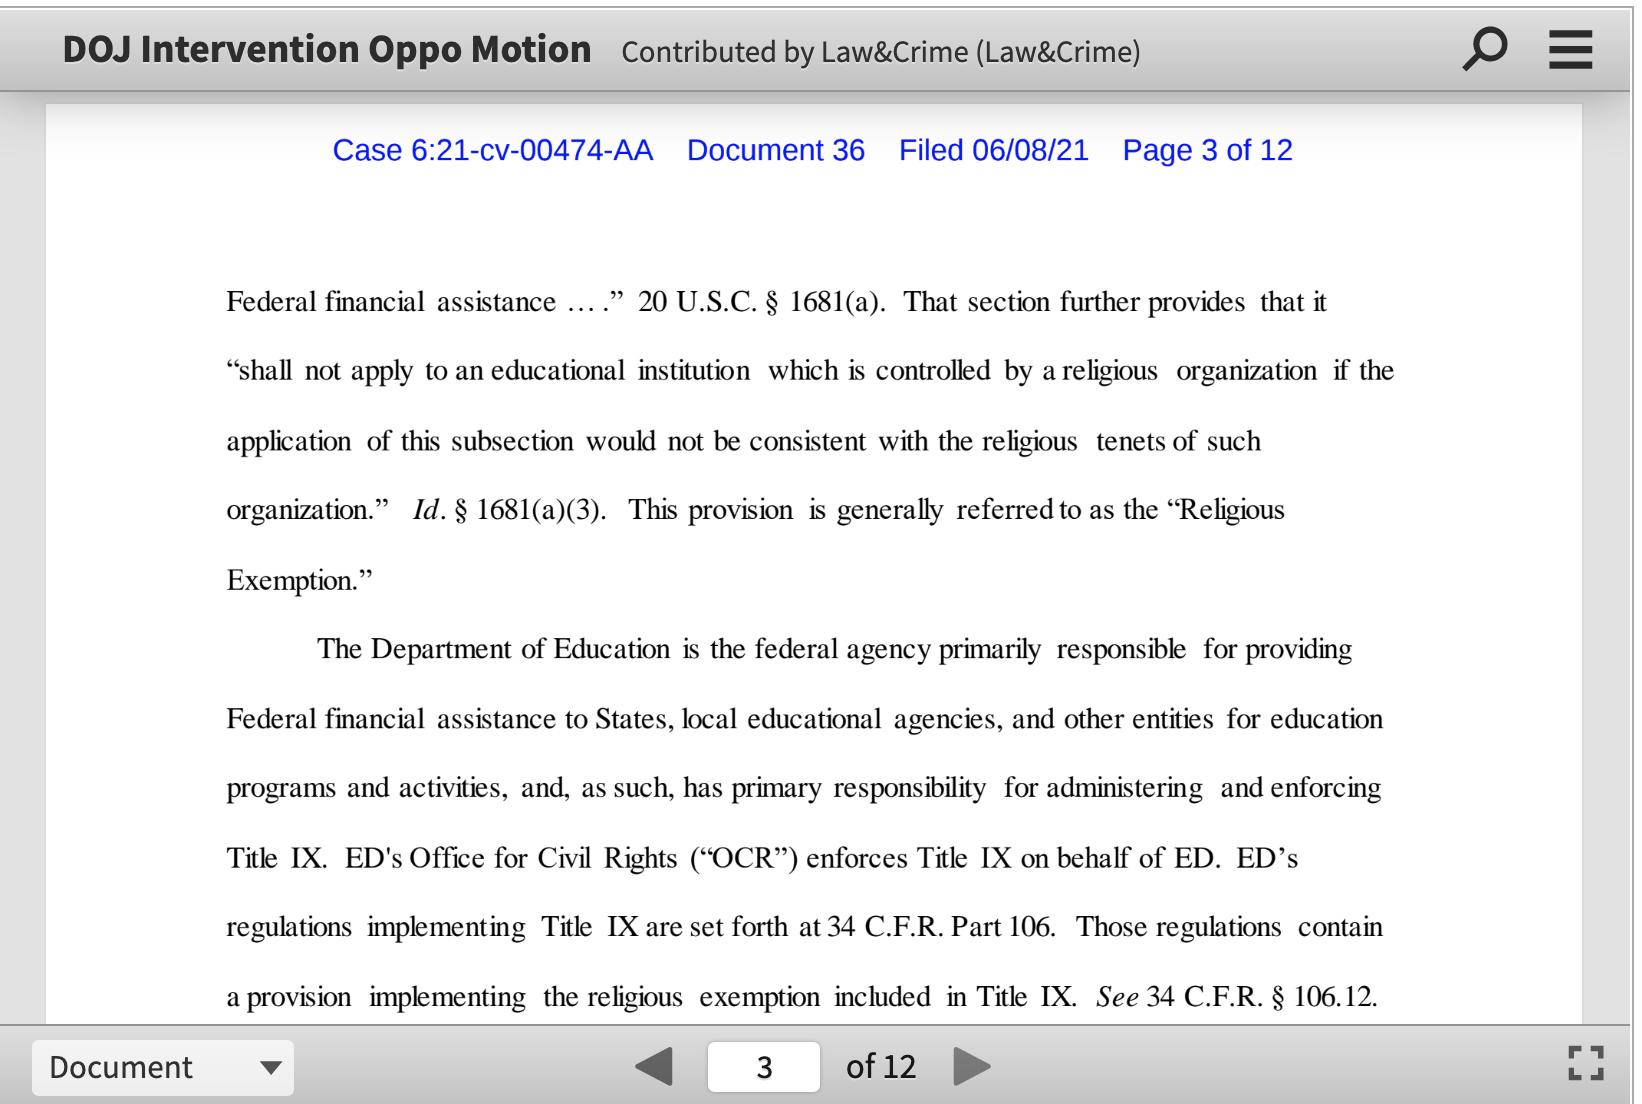 Screen-Shot-2021-06-09-at-6.31.41-PM Garland Defends Law That Lets Religious Schools Discriminate Against LGBTQ Featured Joe Biden LGBT Politics Top Stories